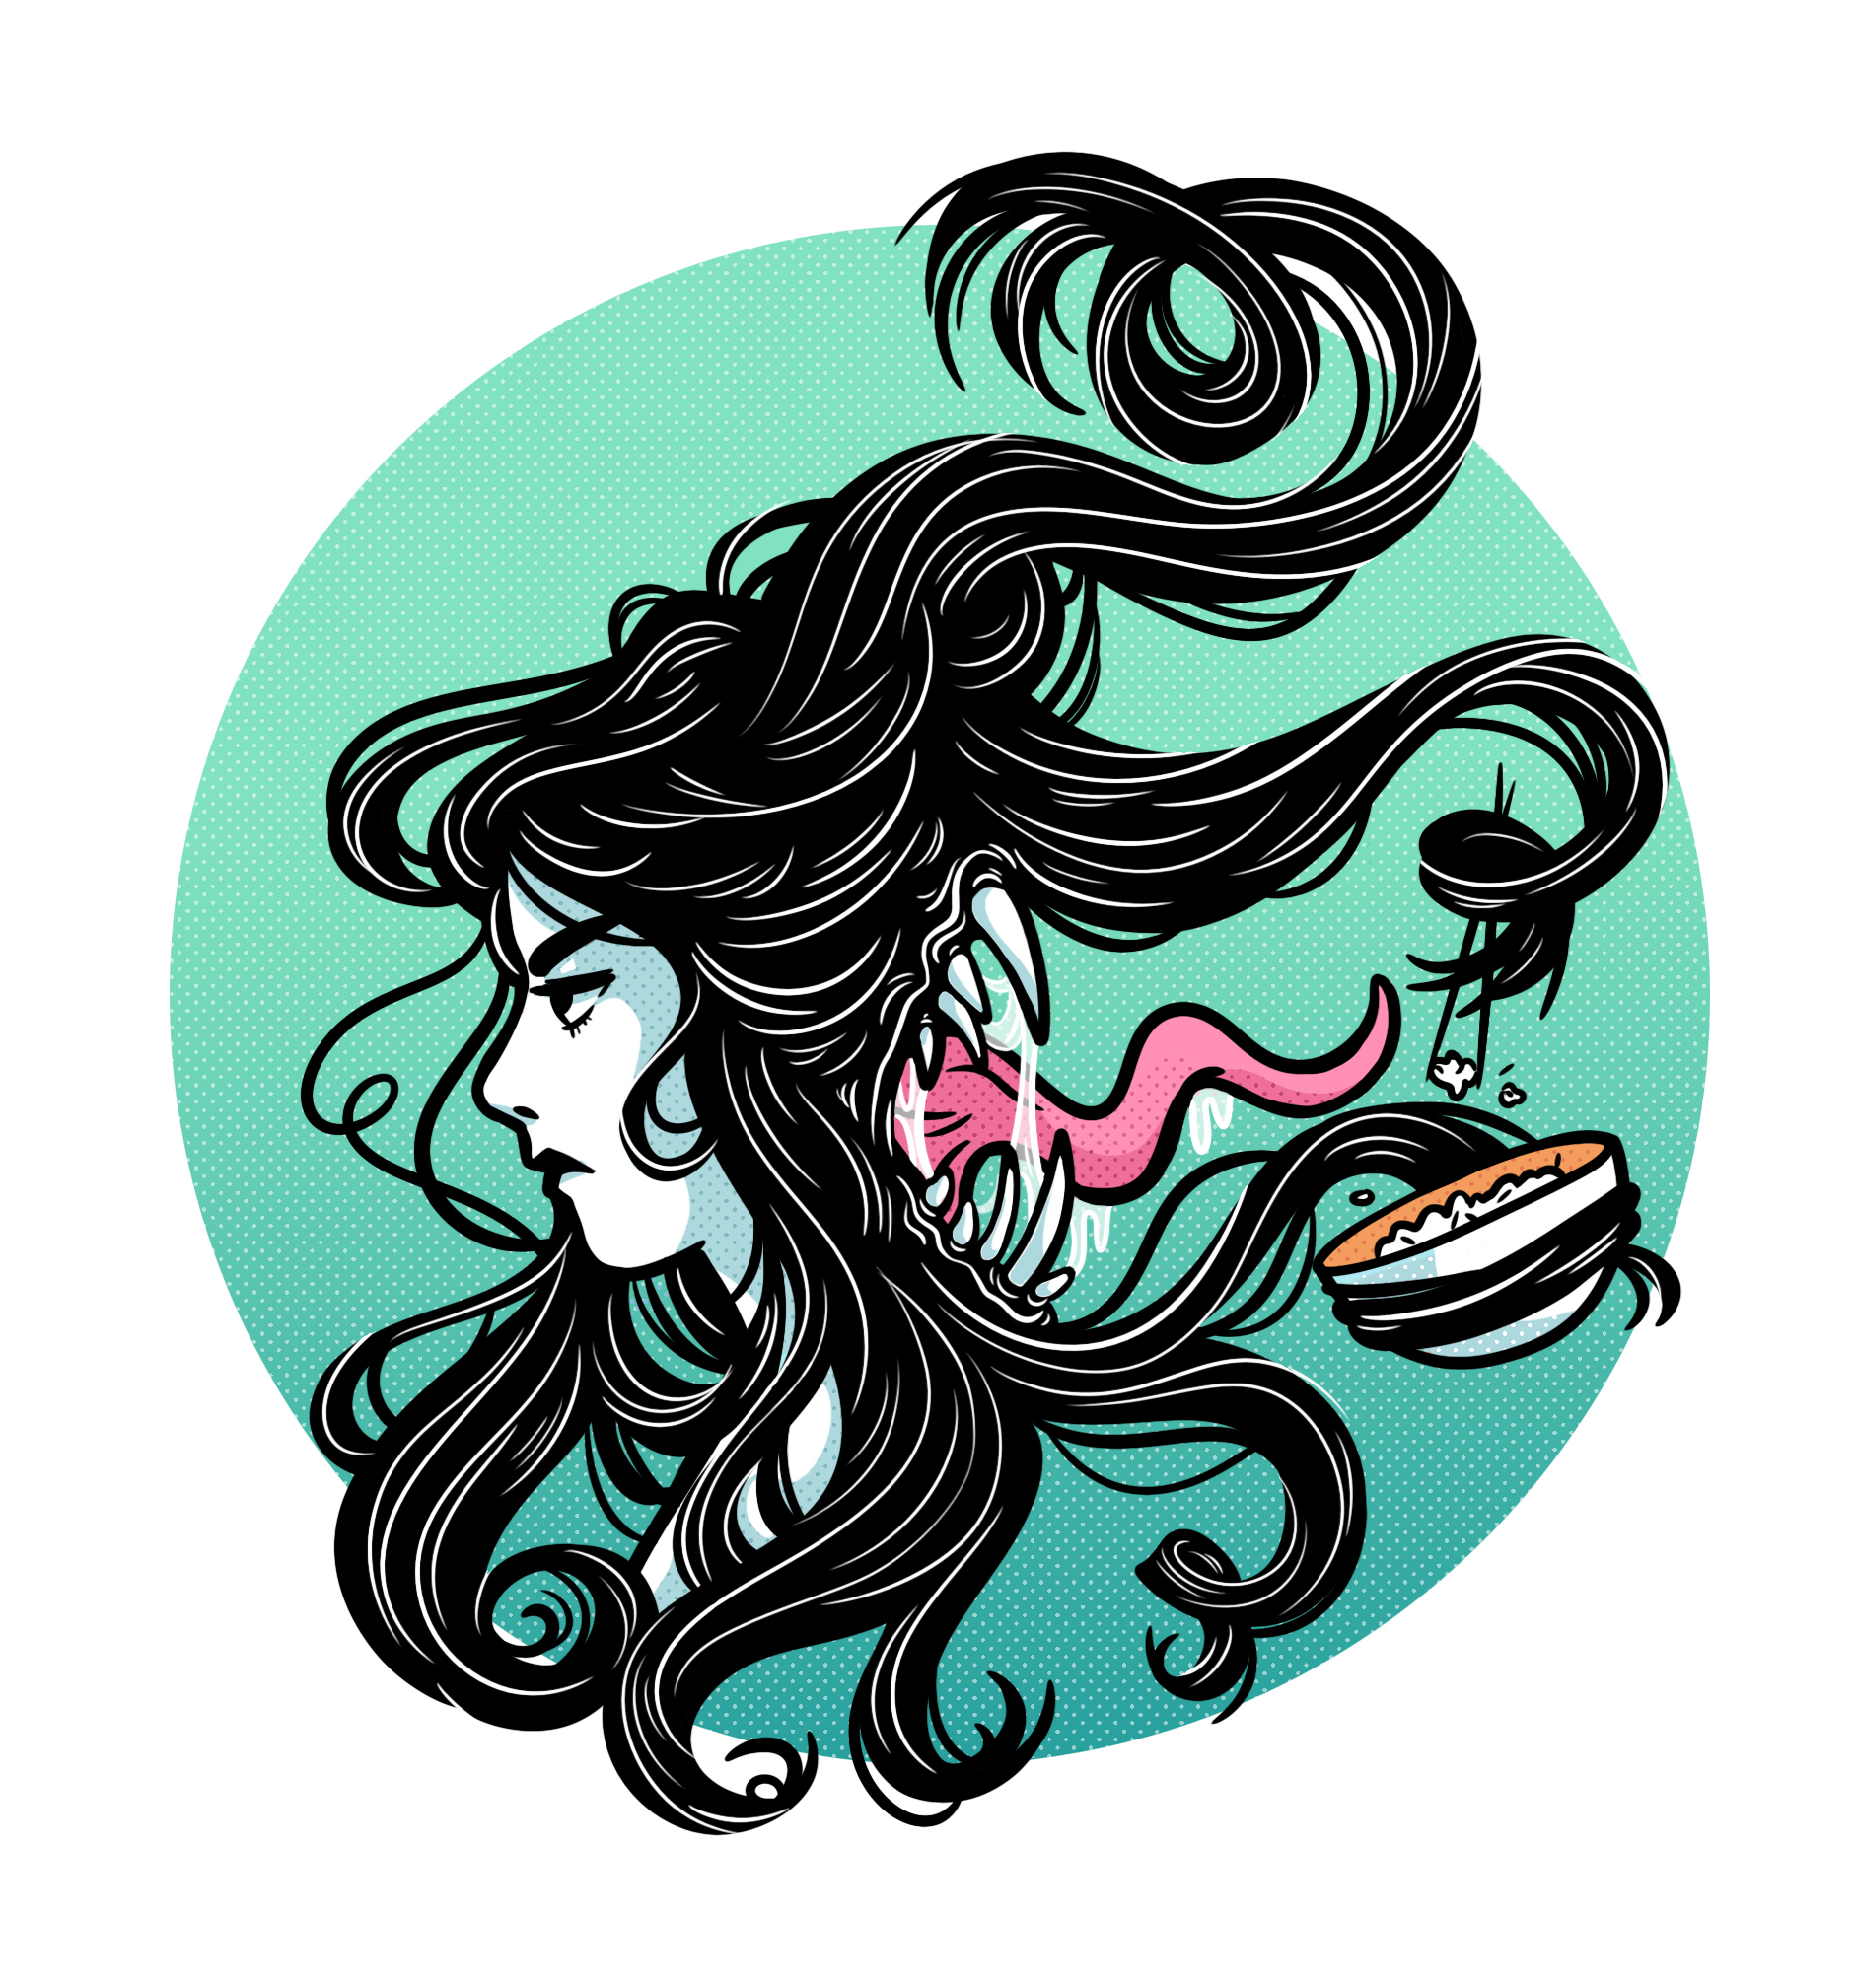 Illustrations by Megan Hindman